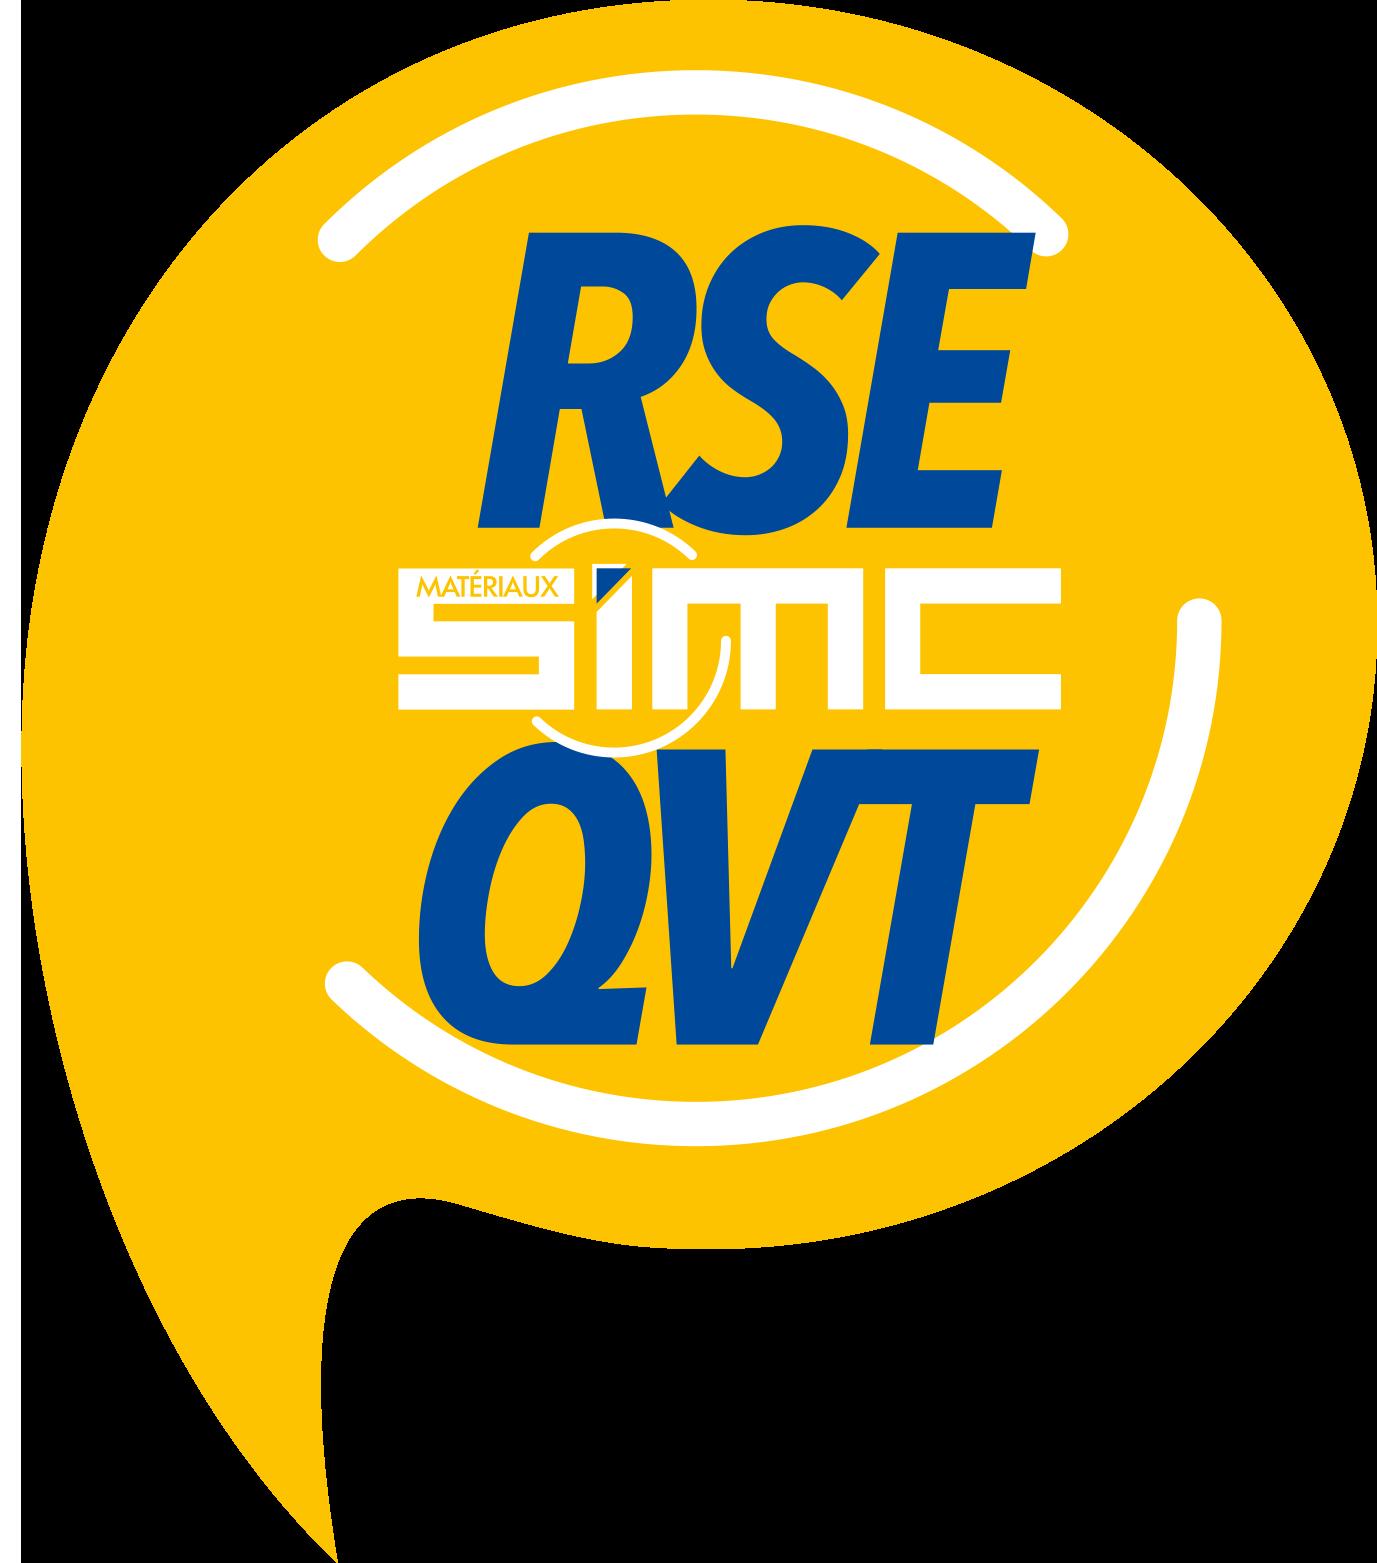 Logo RSE-QVT